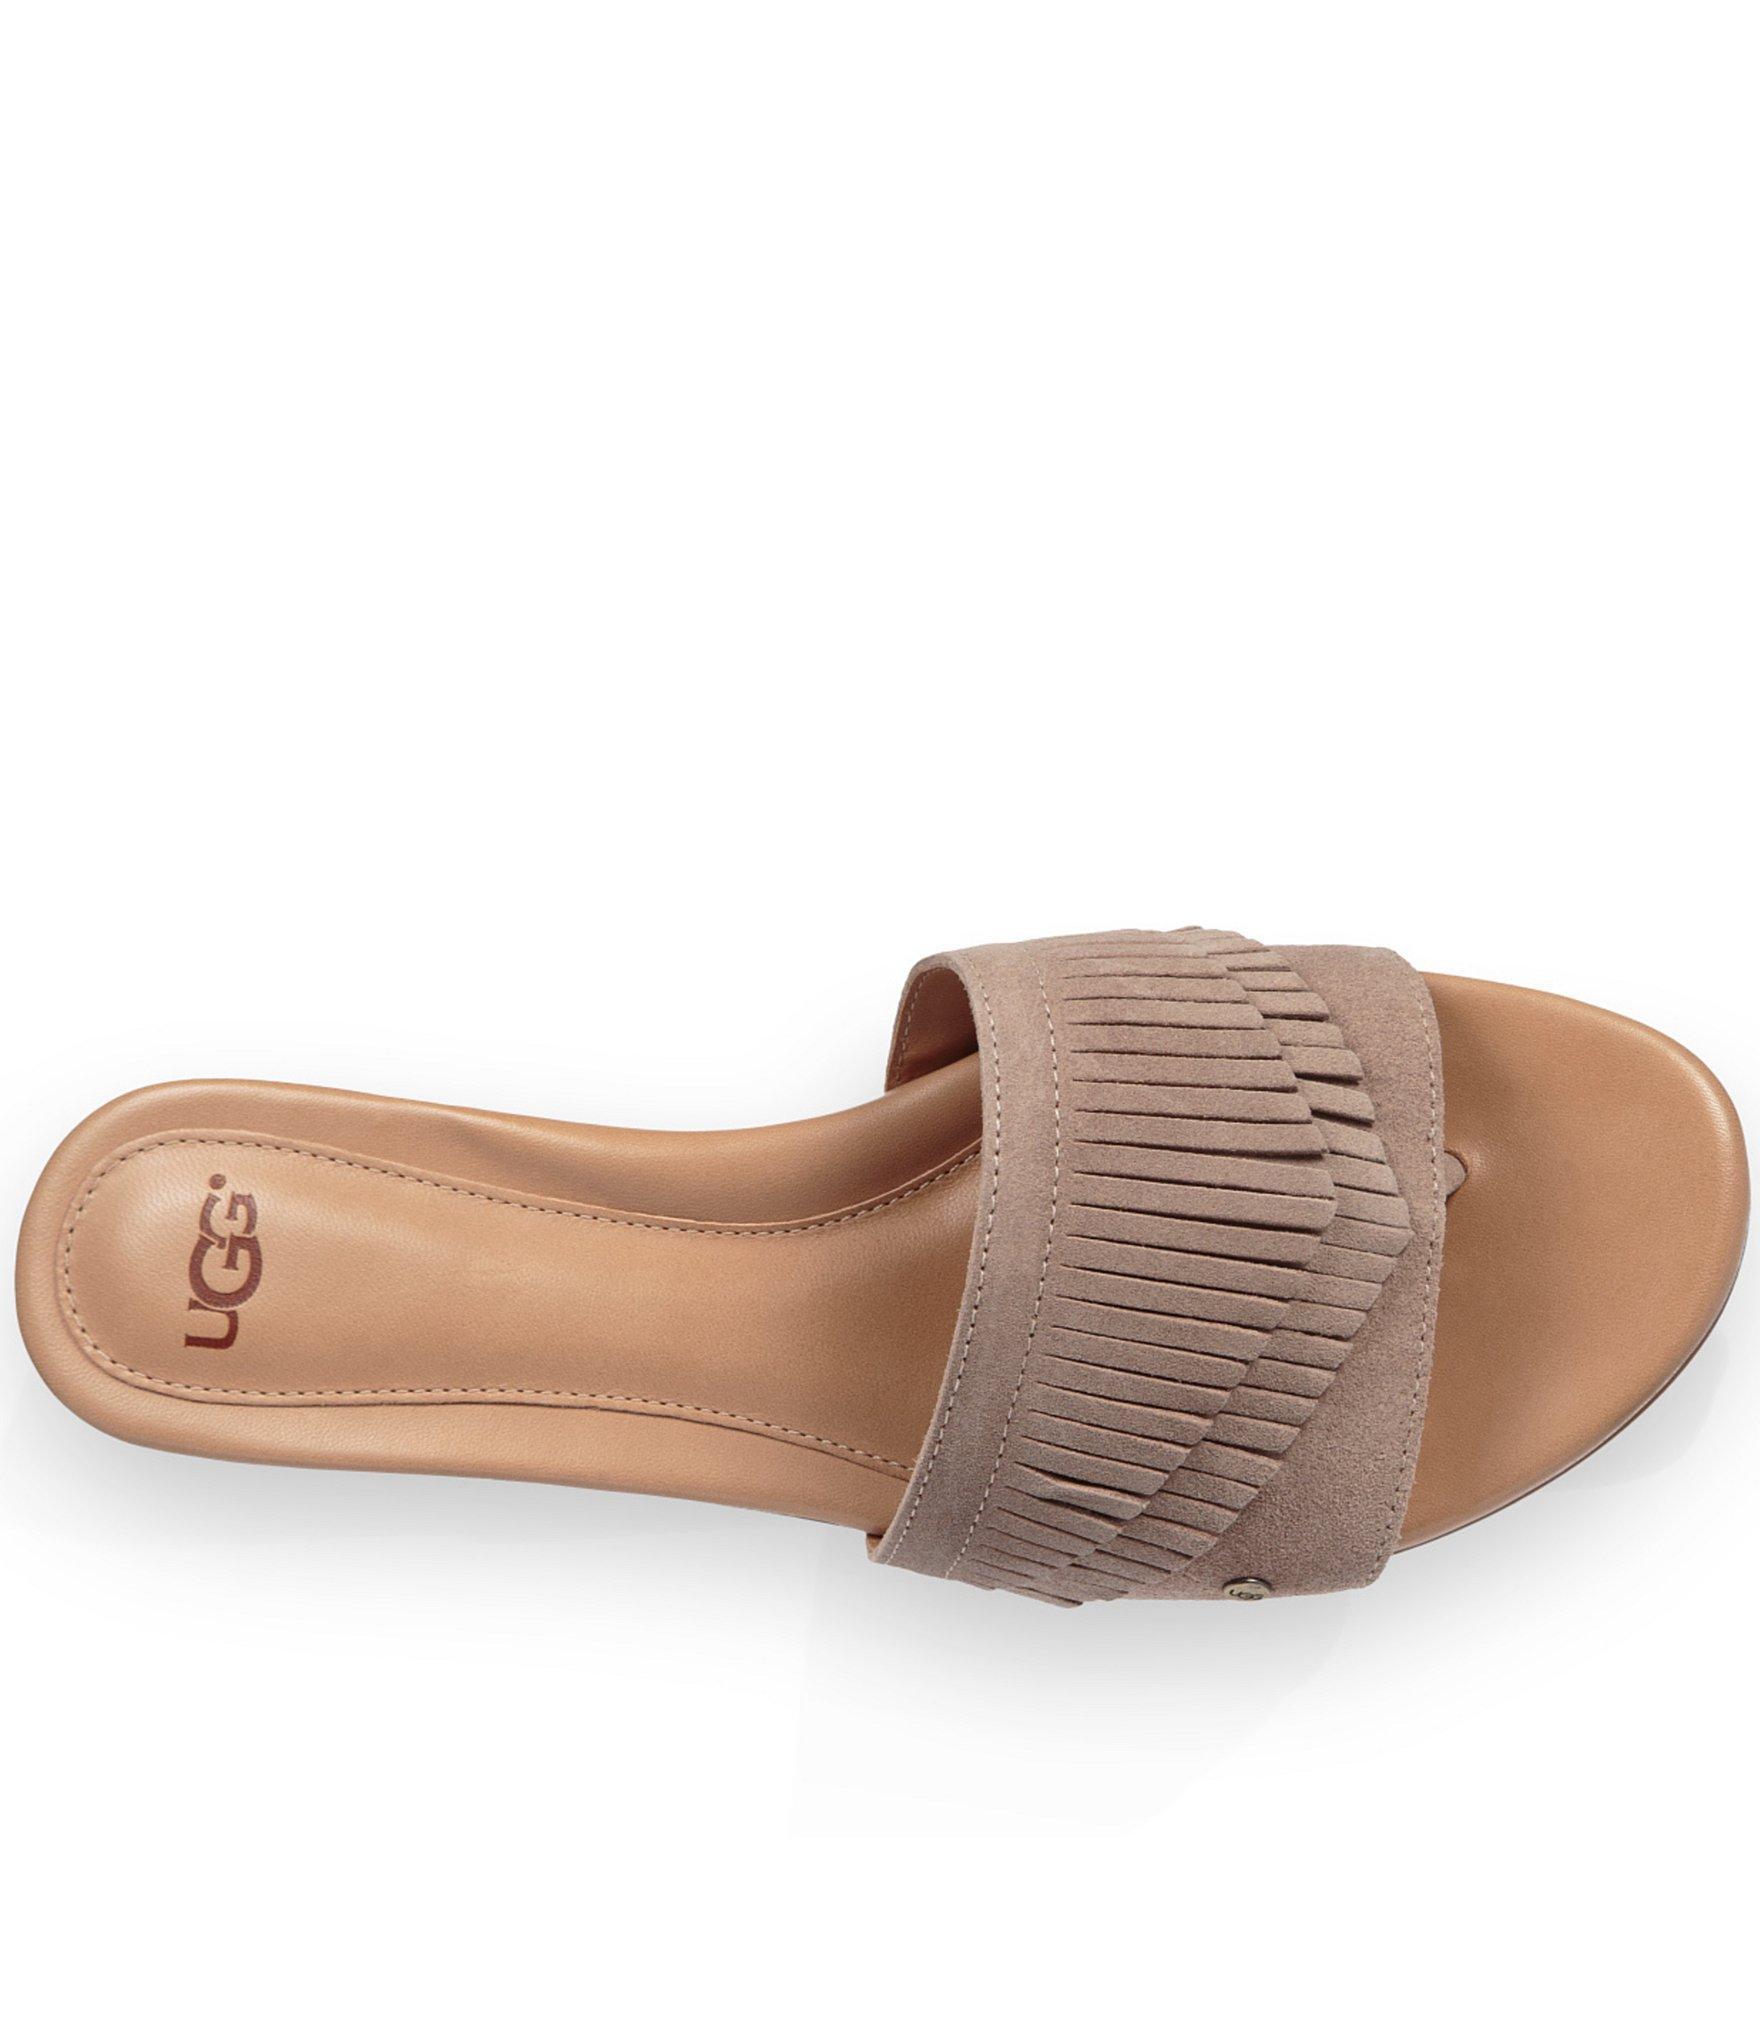 Lyst Ugg 174 Binx Slide On Sandals In Black